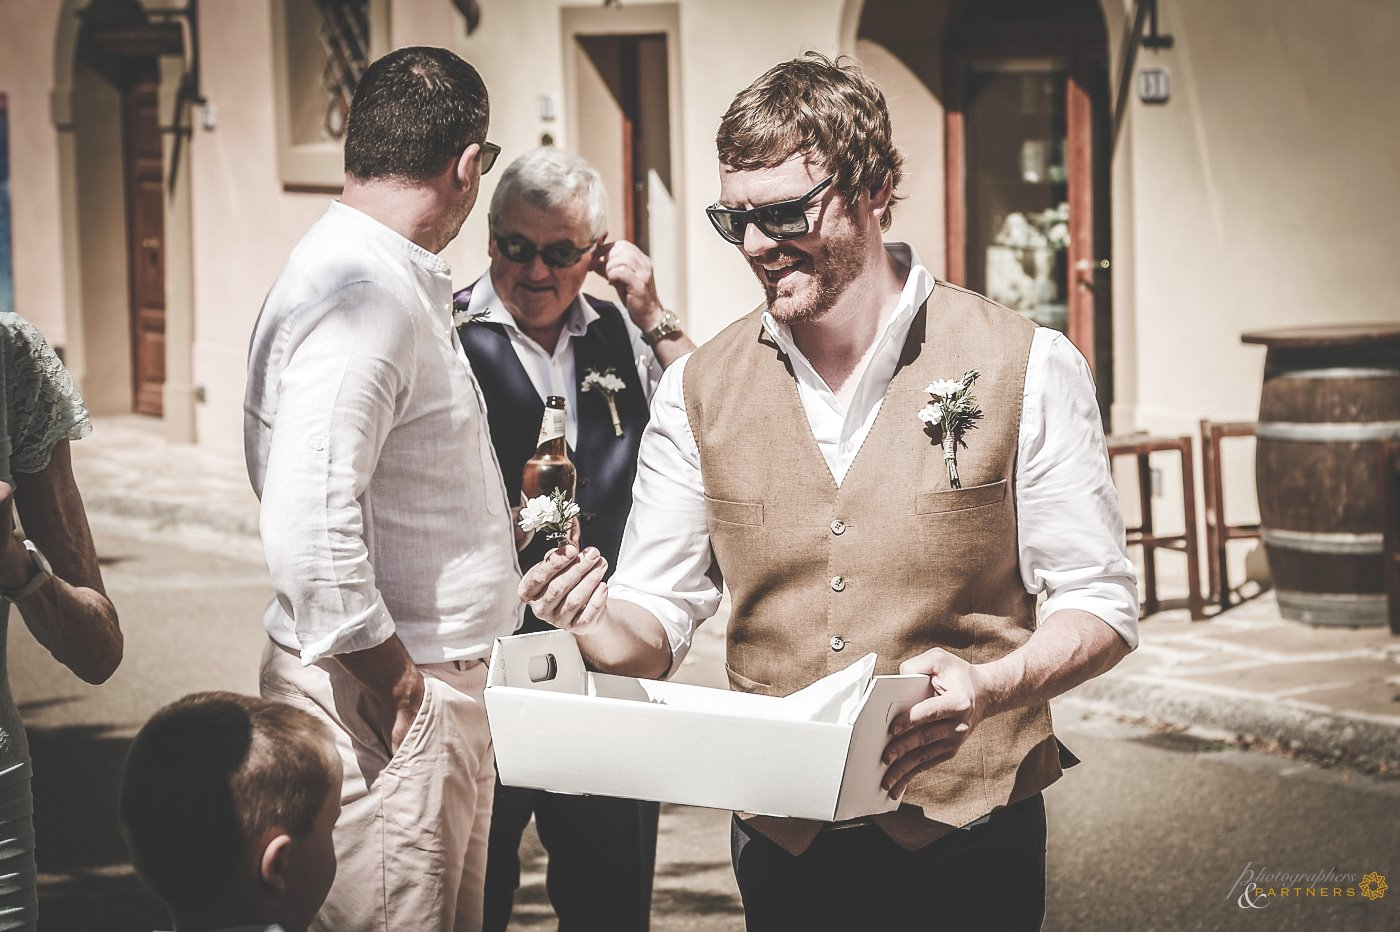 photo_weddings_castelfalfi_03.jpg